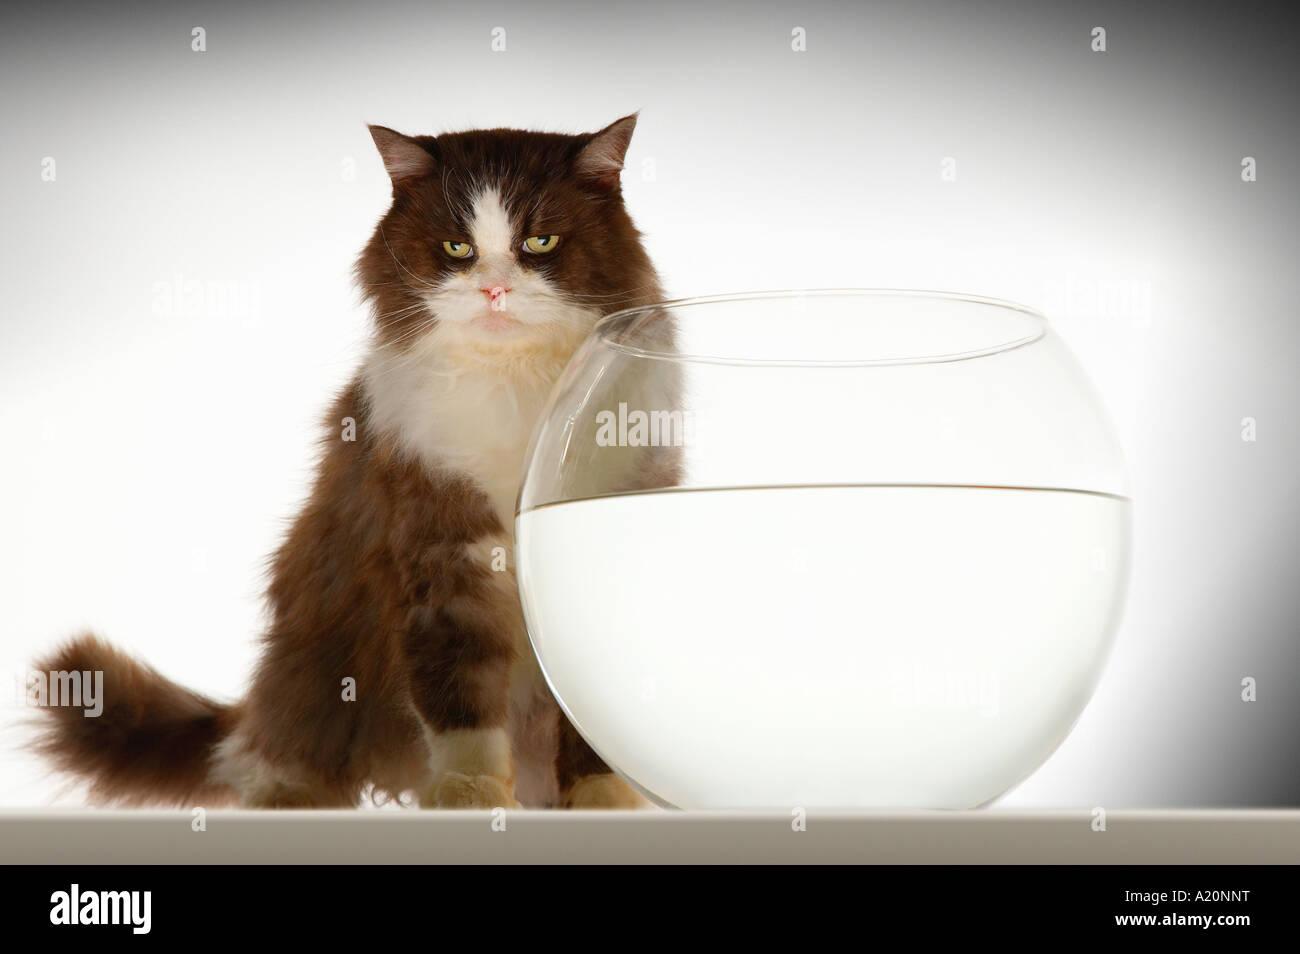 Cat Fishbowl Fish Bowl Imágenes De Stock & Cat Fishbowl Fish Bowl ...